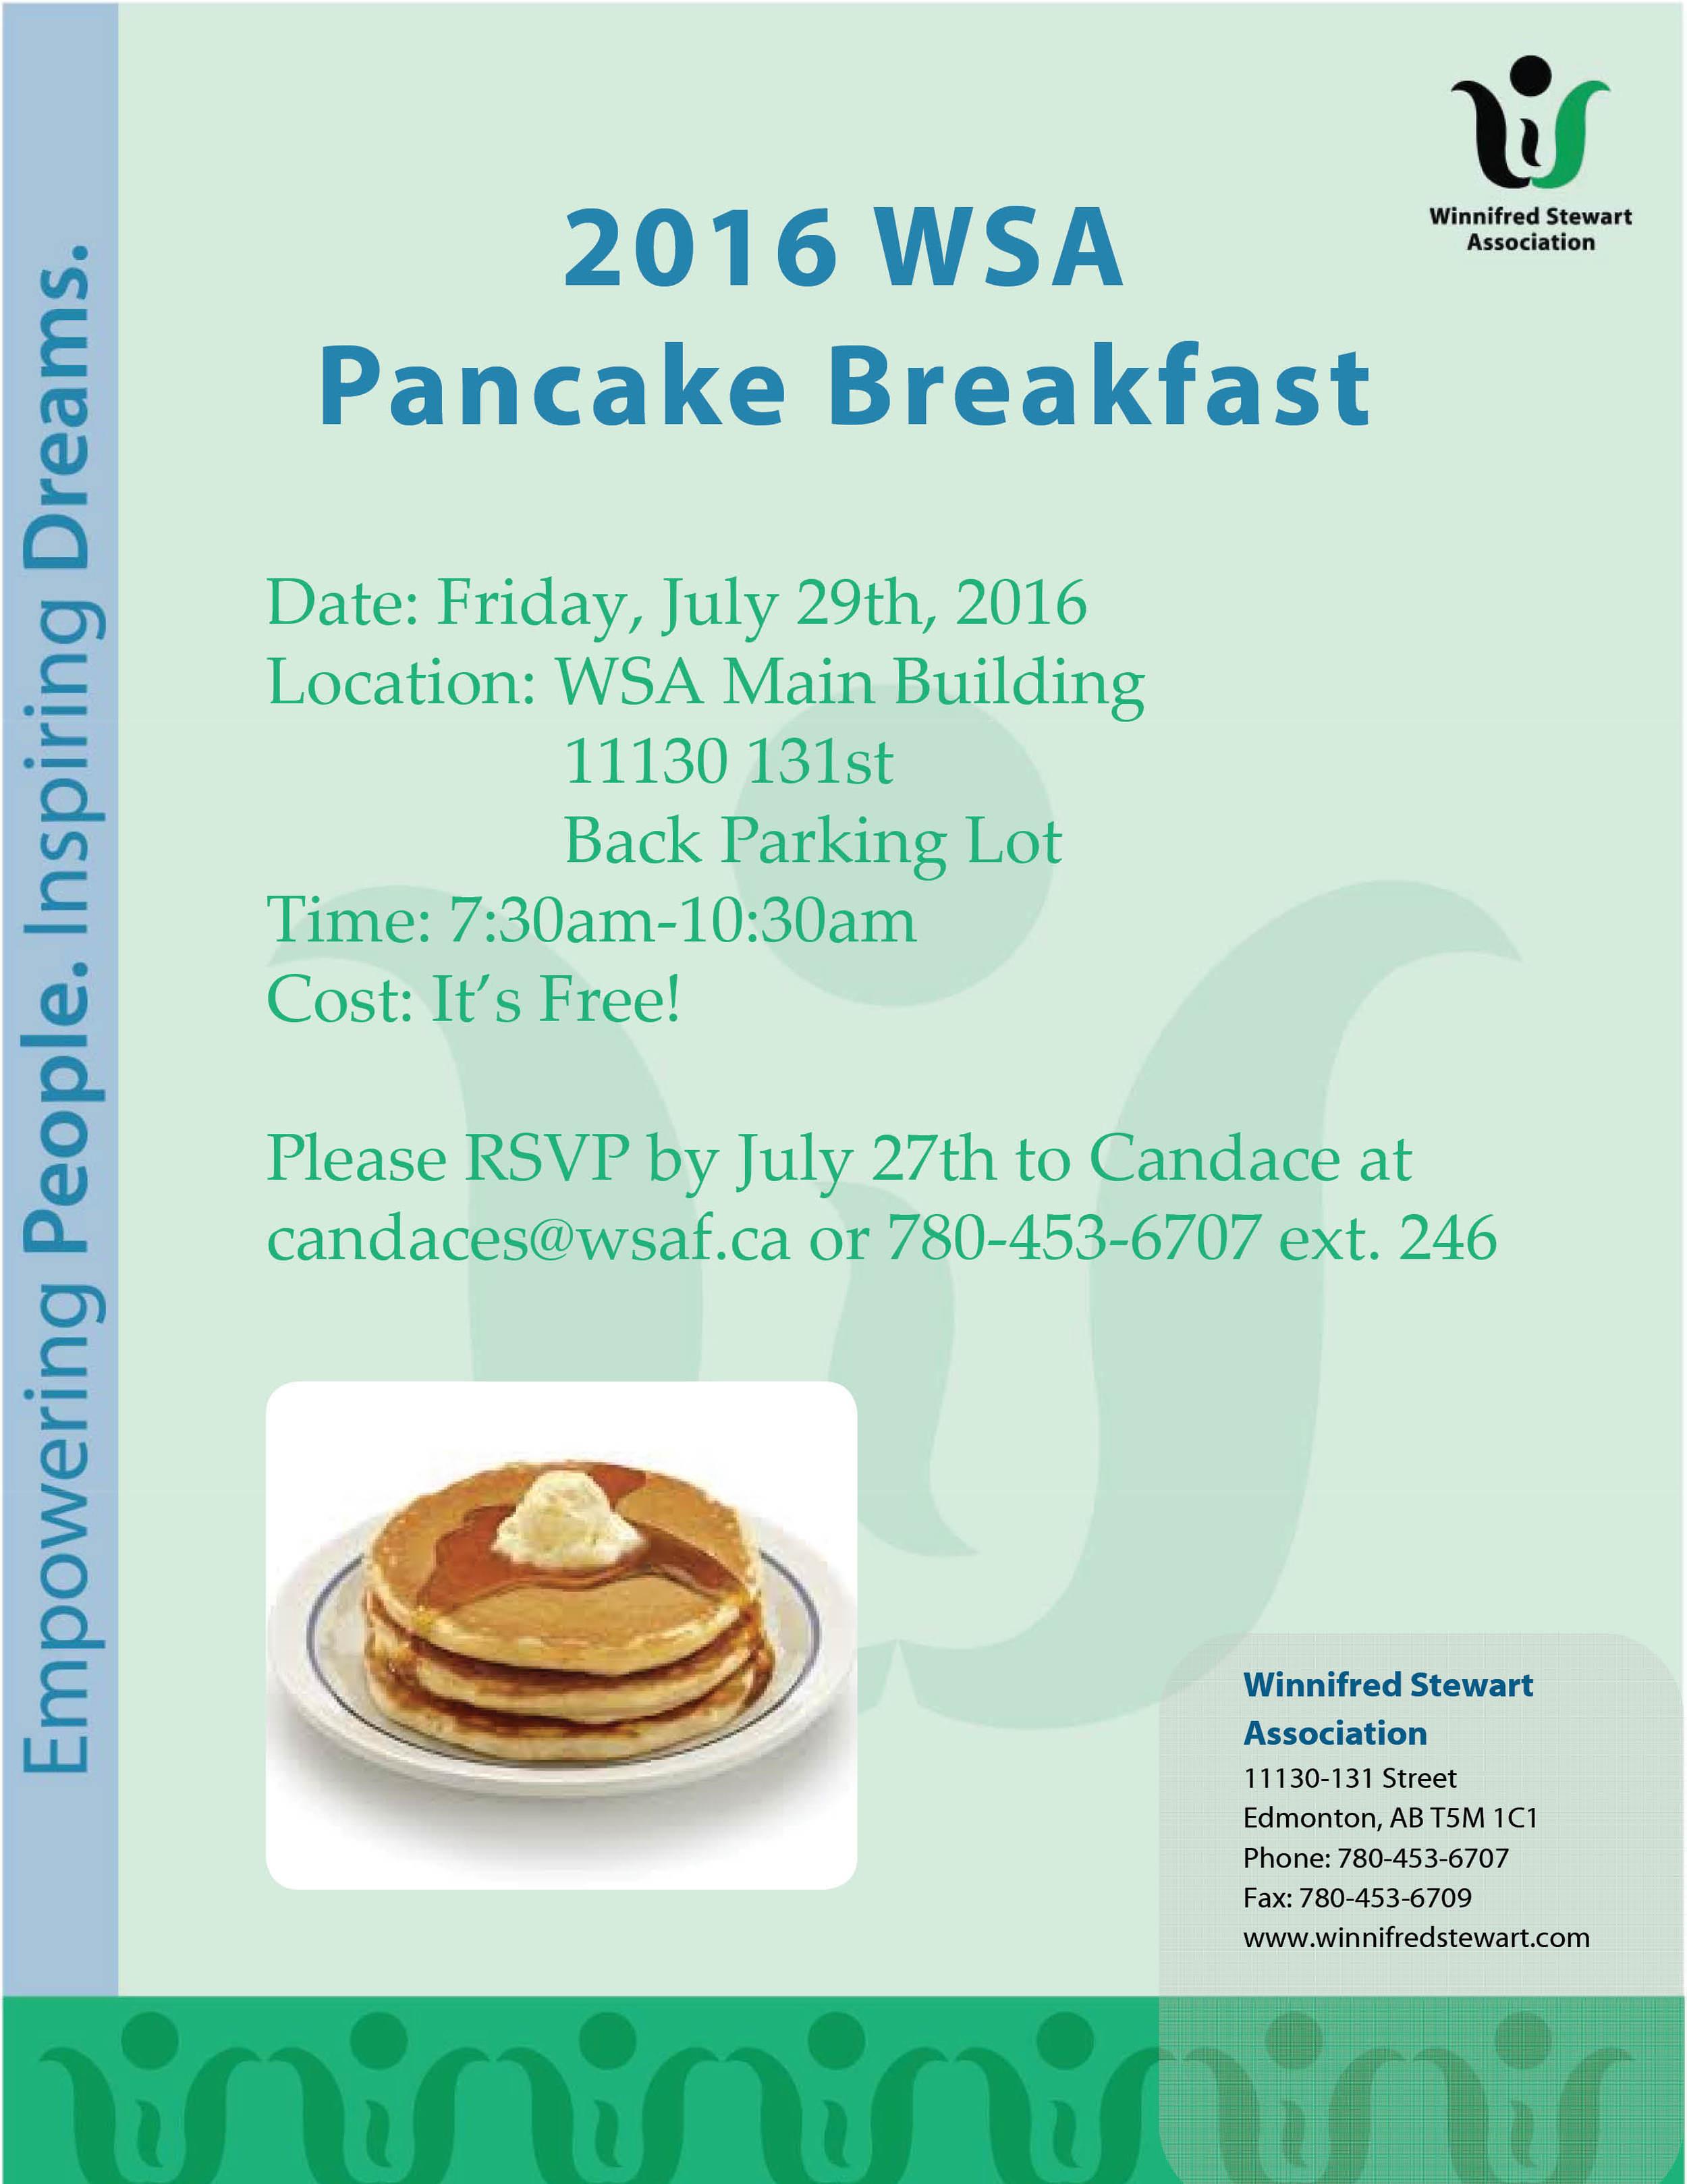 Pancake Breakfast Invite